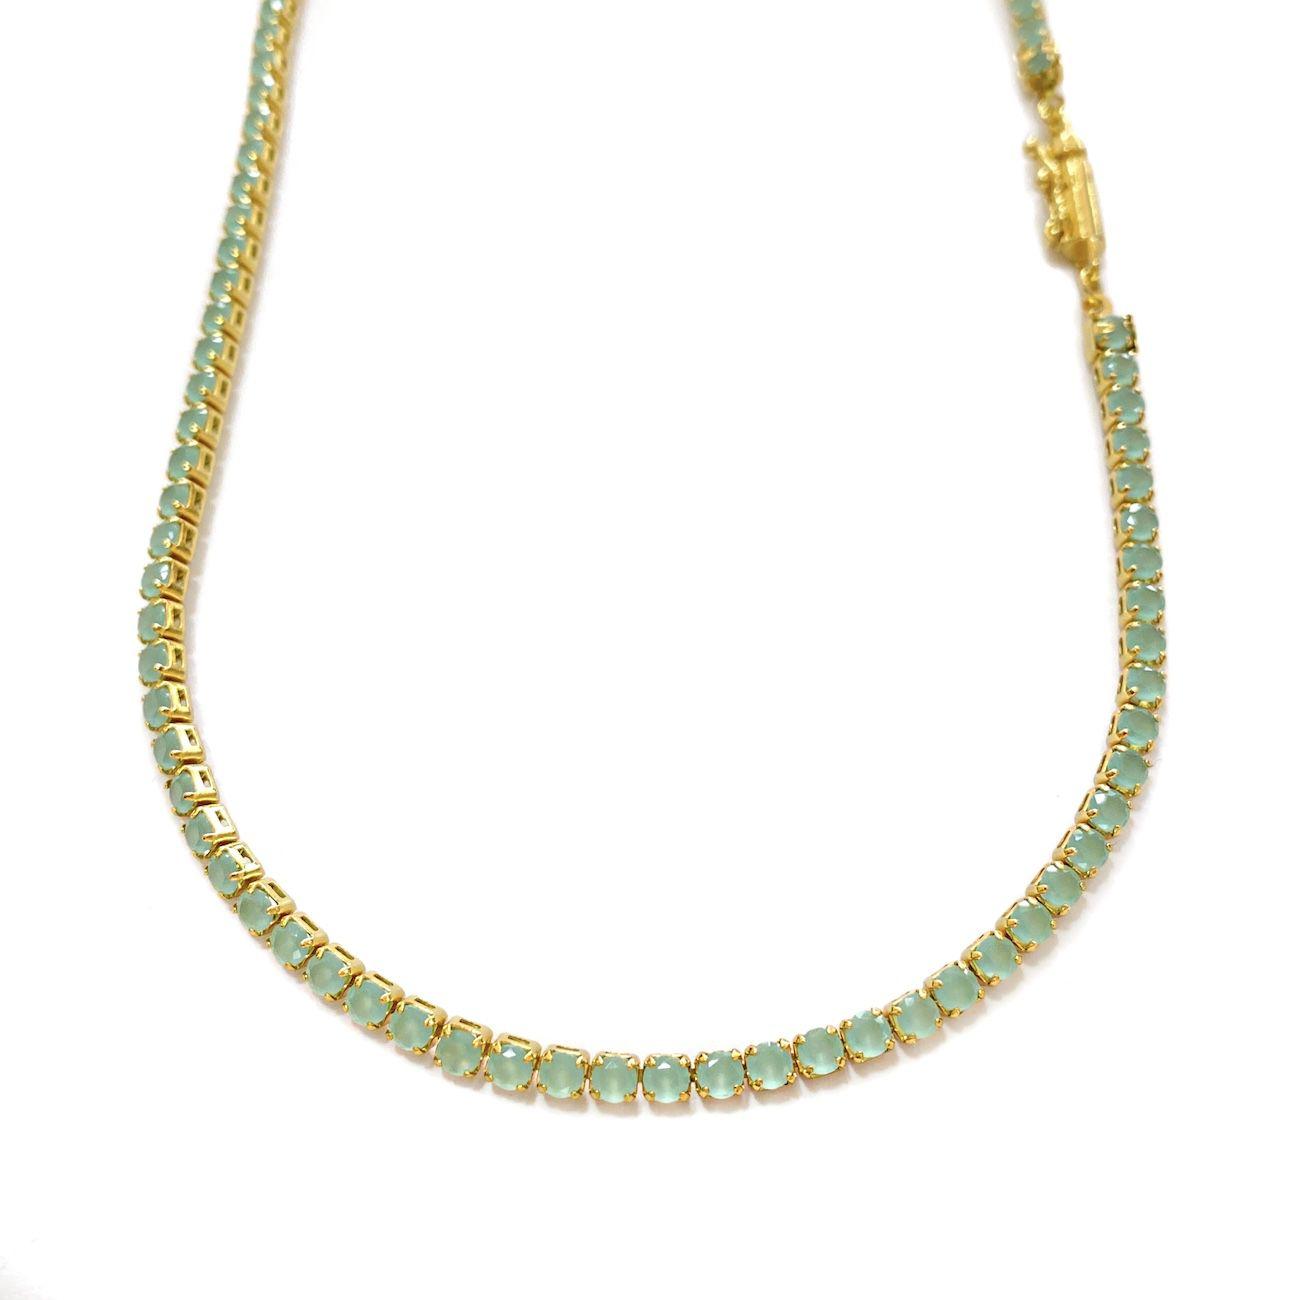 Corrente Riviera Tennis Chain 3mm 60cm 14g (Pedra Zircônia verde) (Banho Ouro 24k)